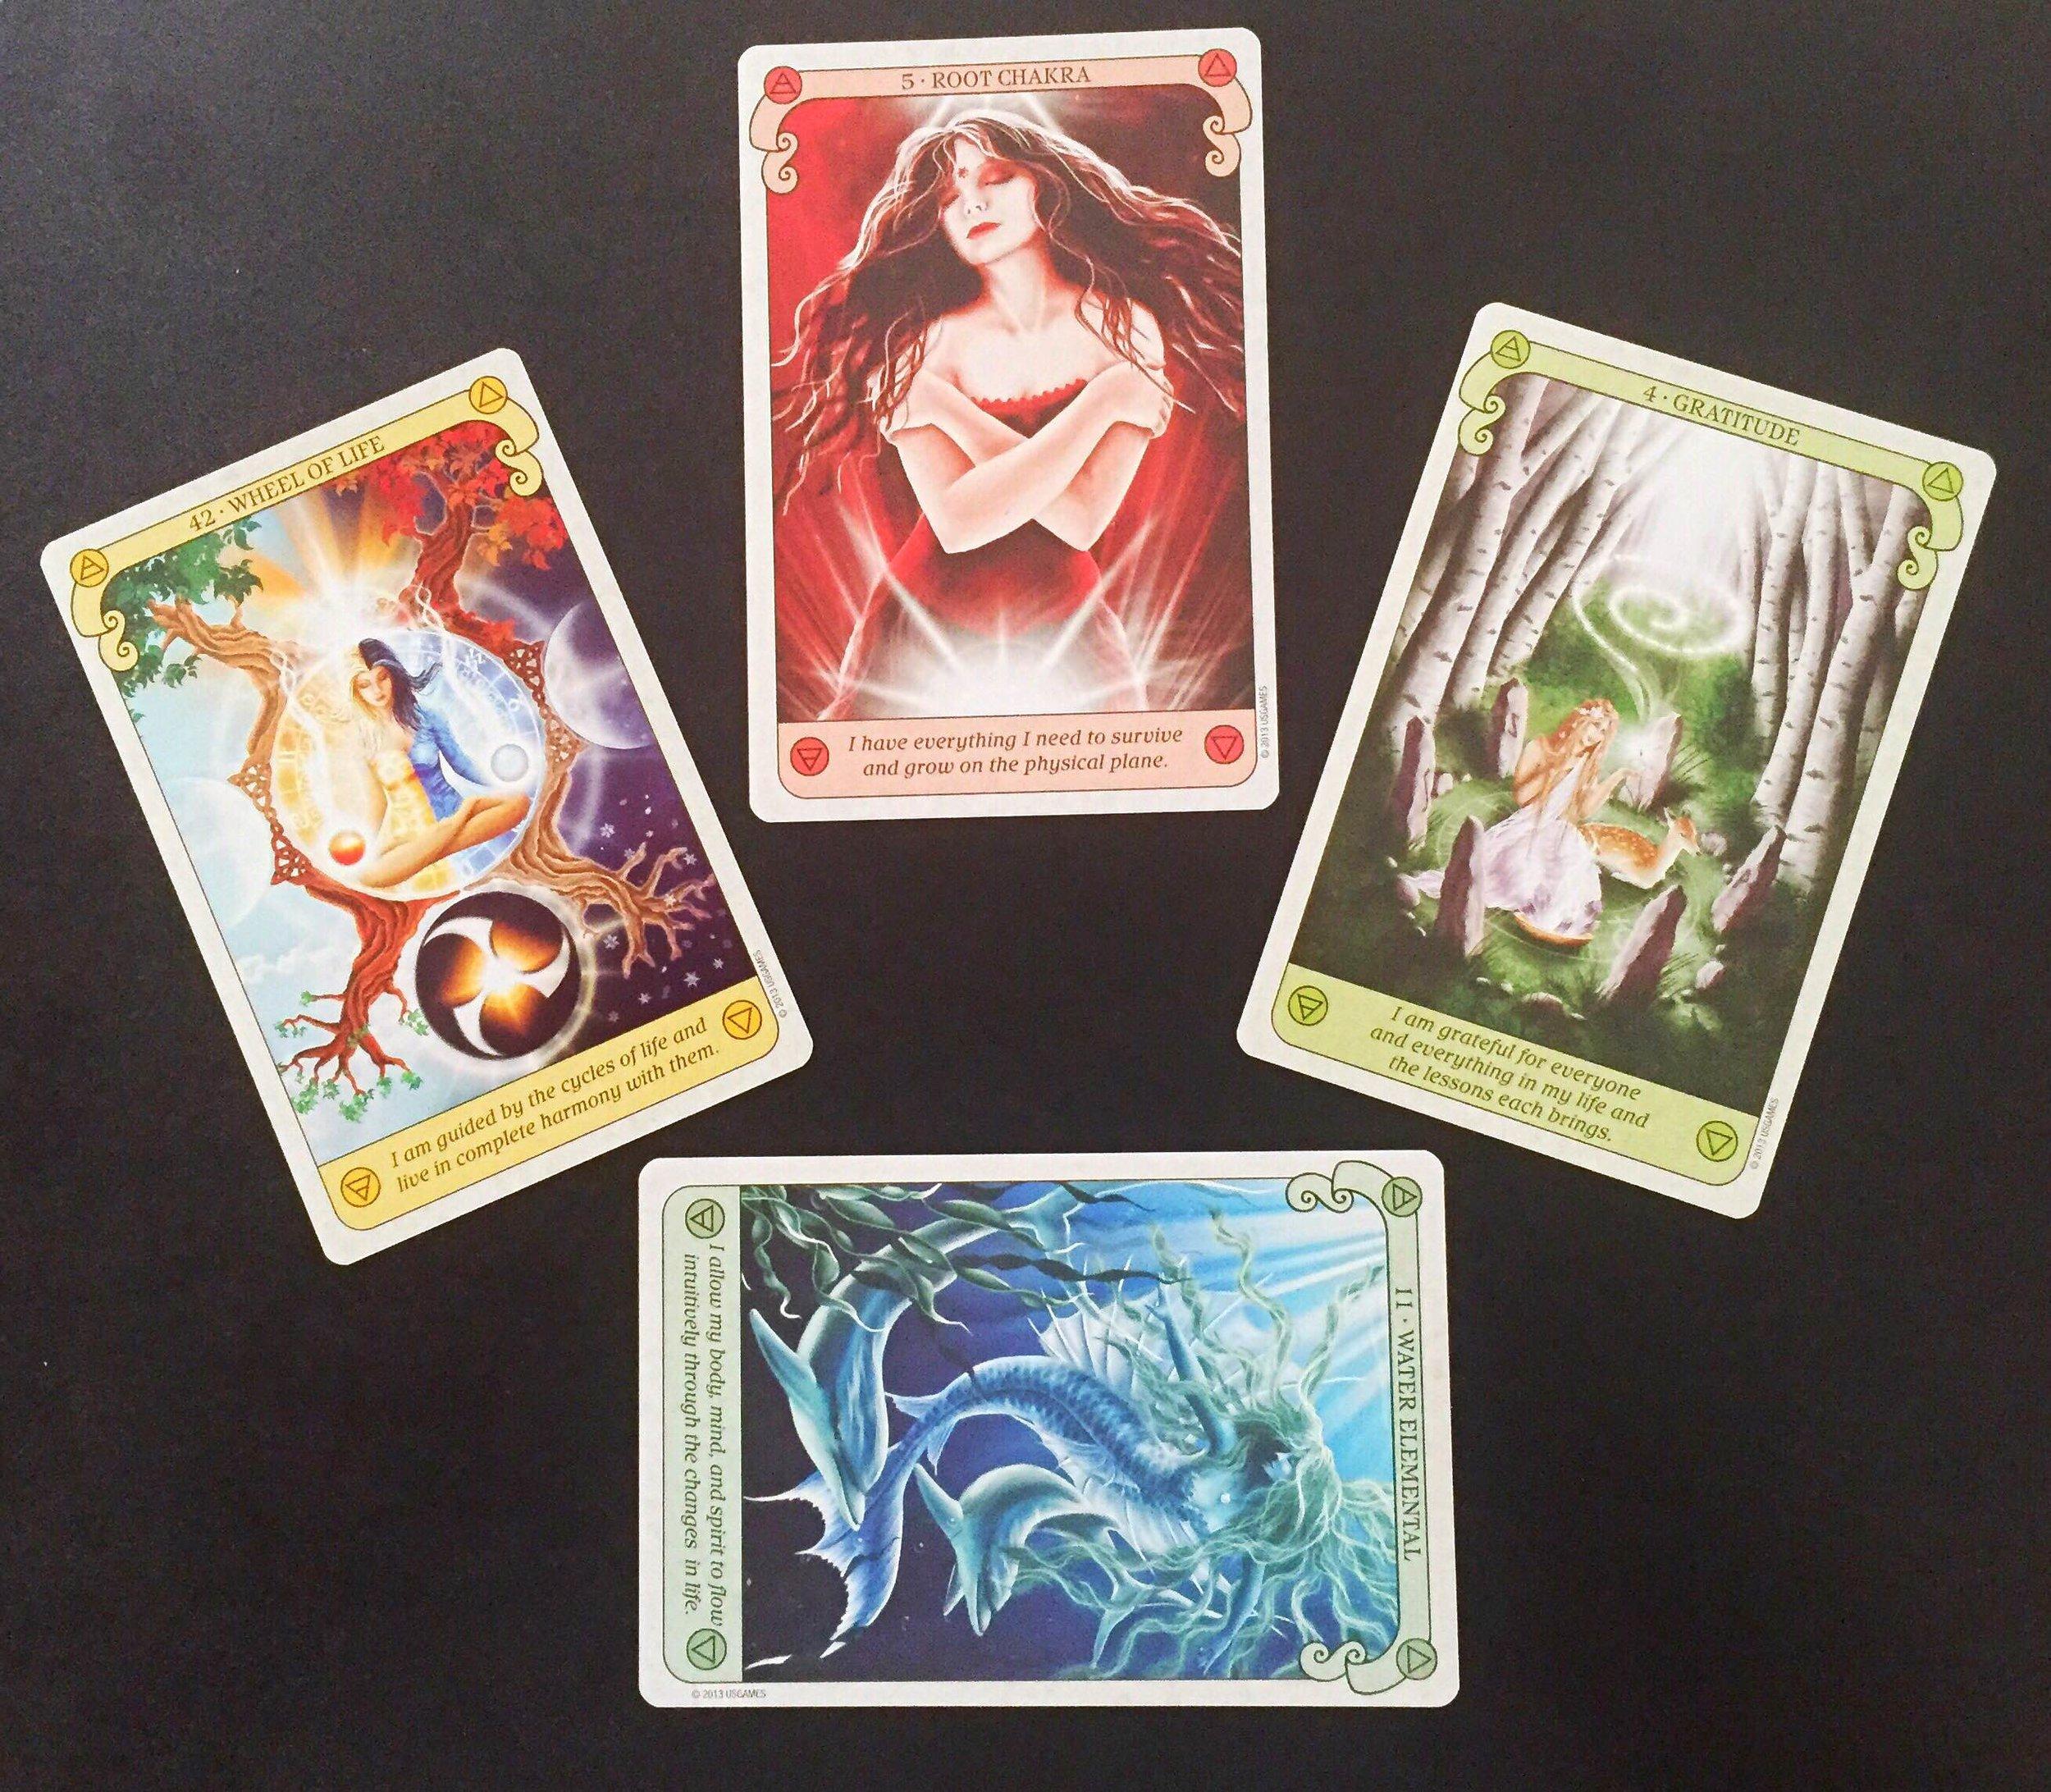 crown-chakra-spread-card-photo.jpg